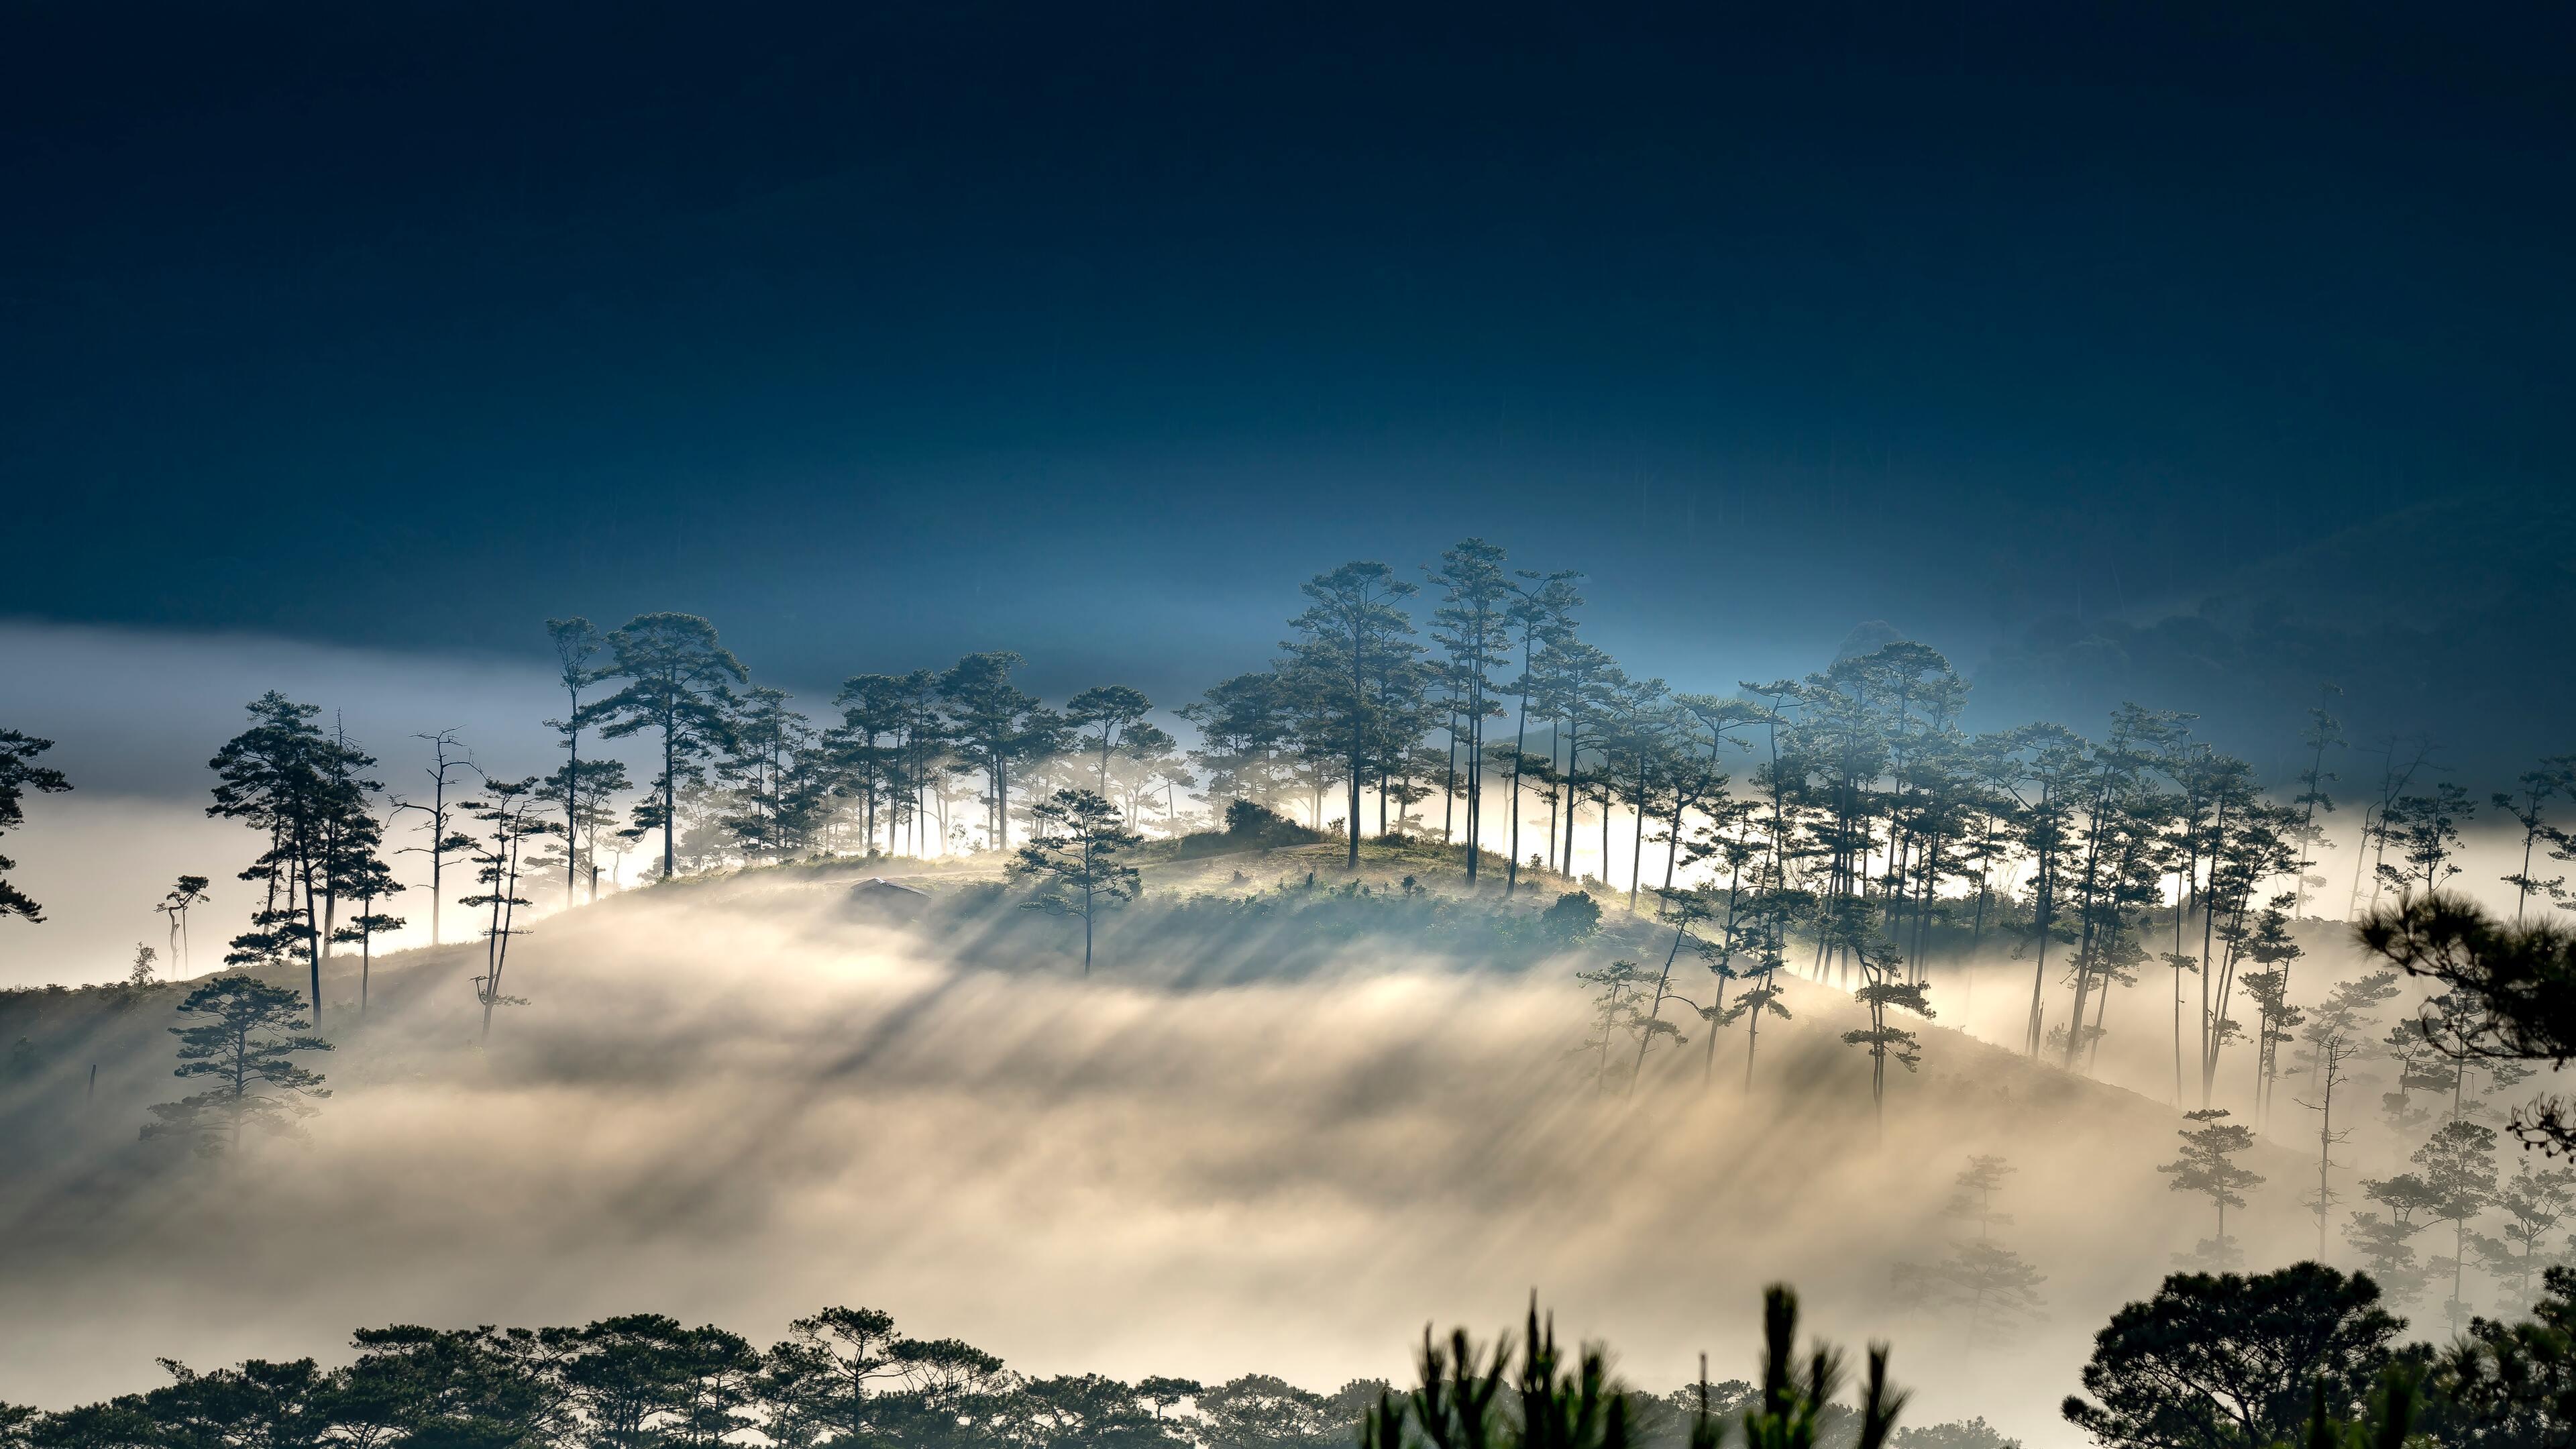 foggy-morning-hills-8k-ea.jpg